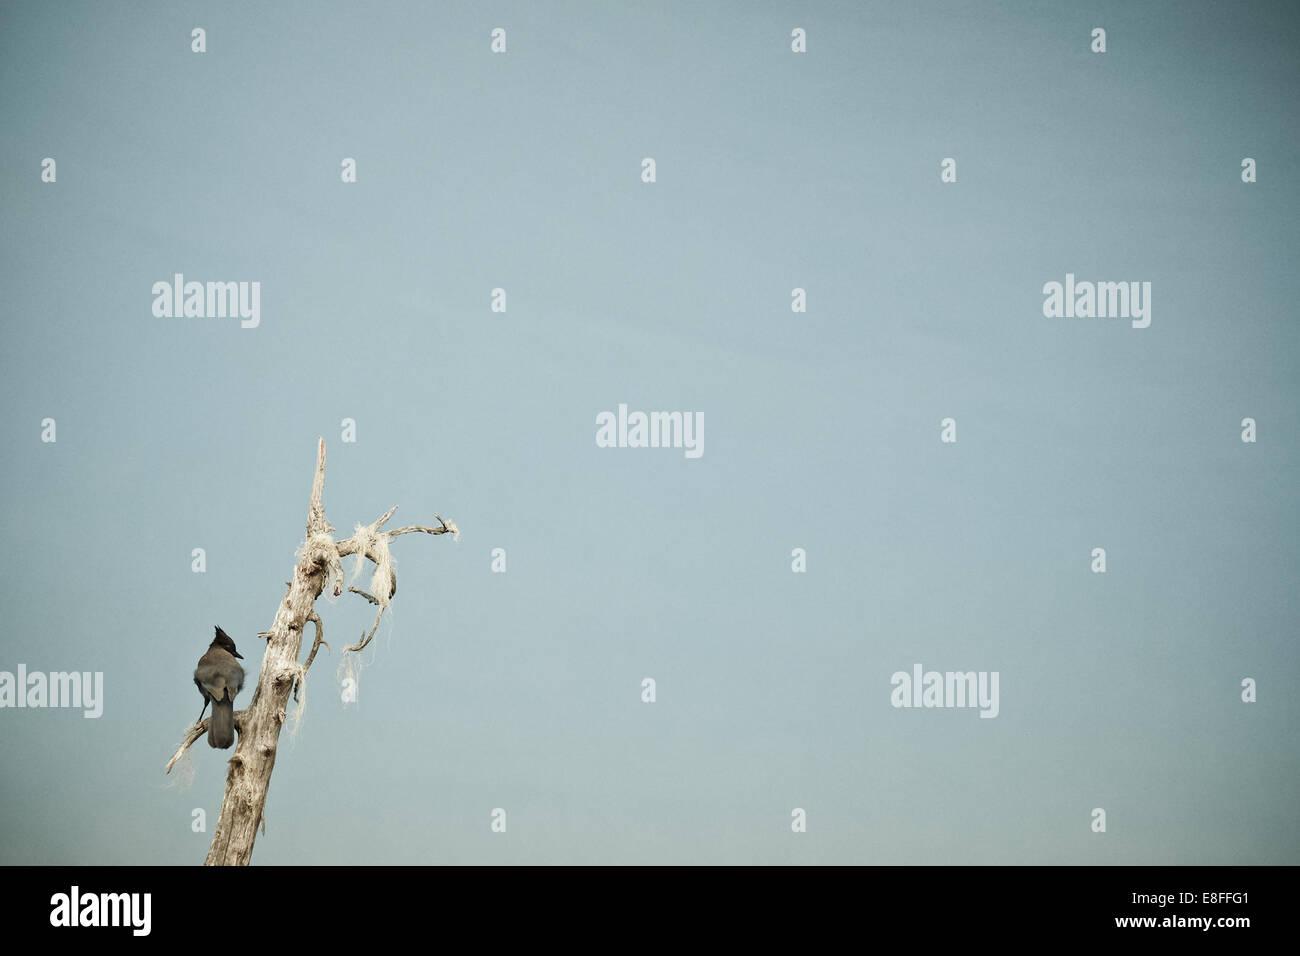 Vogel auf Ast Stockbild